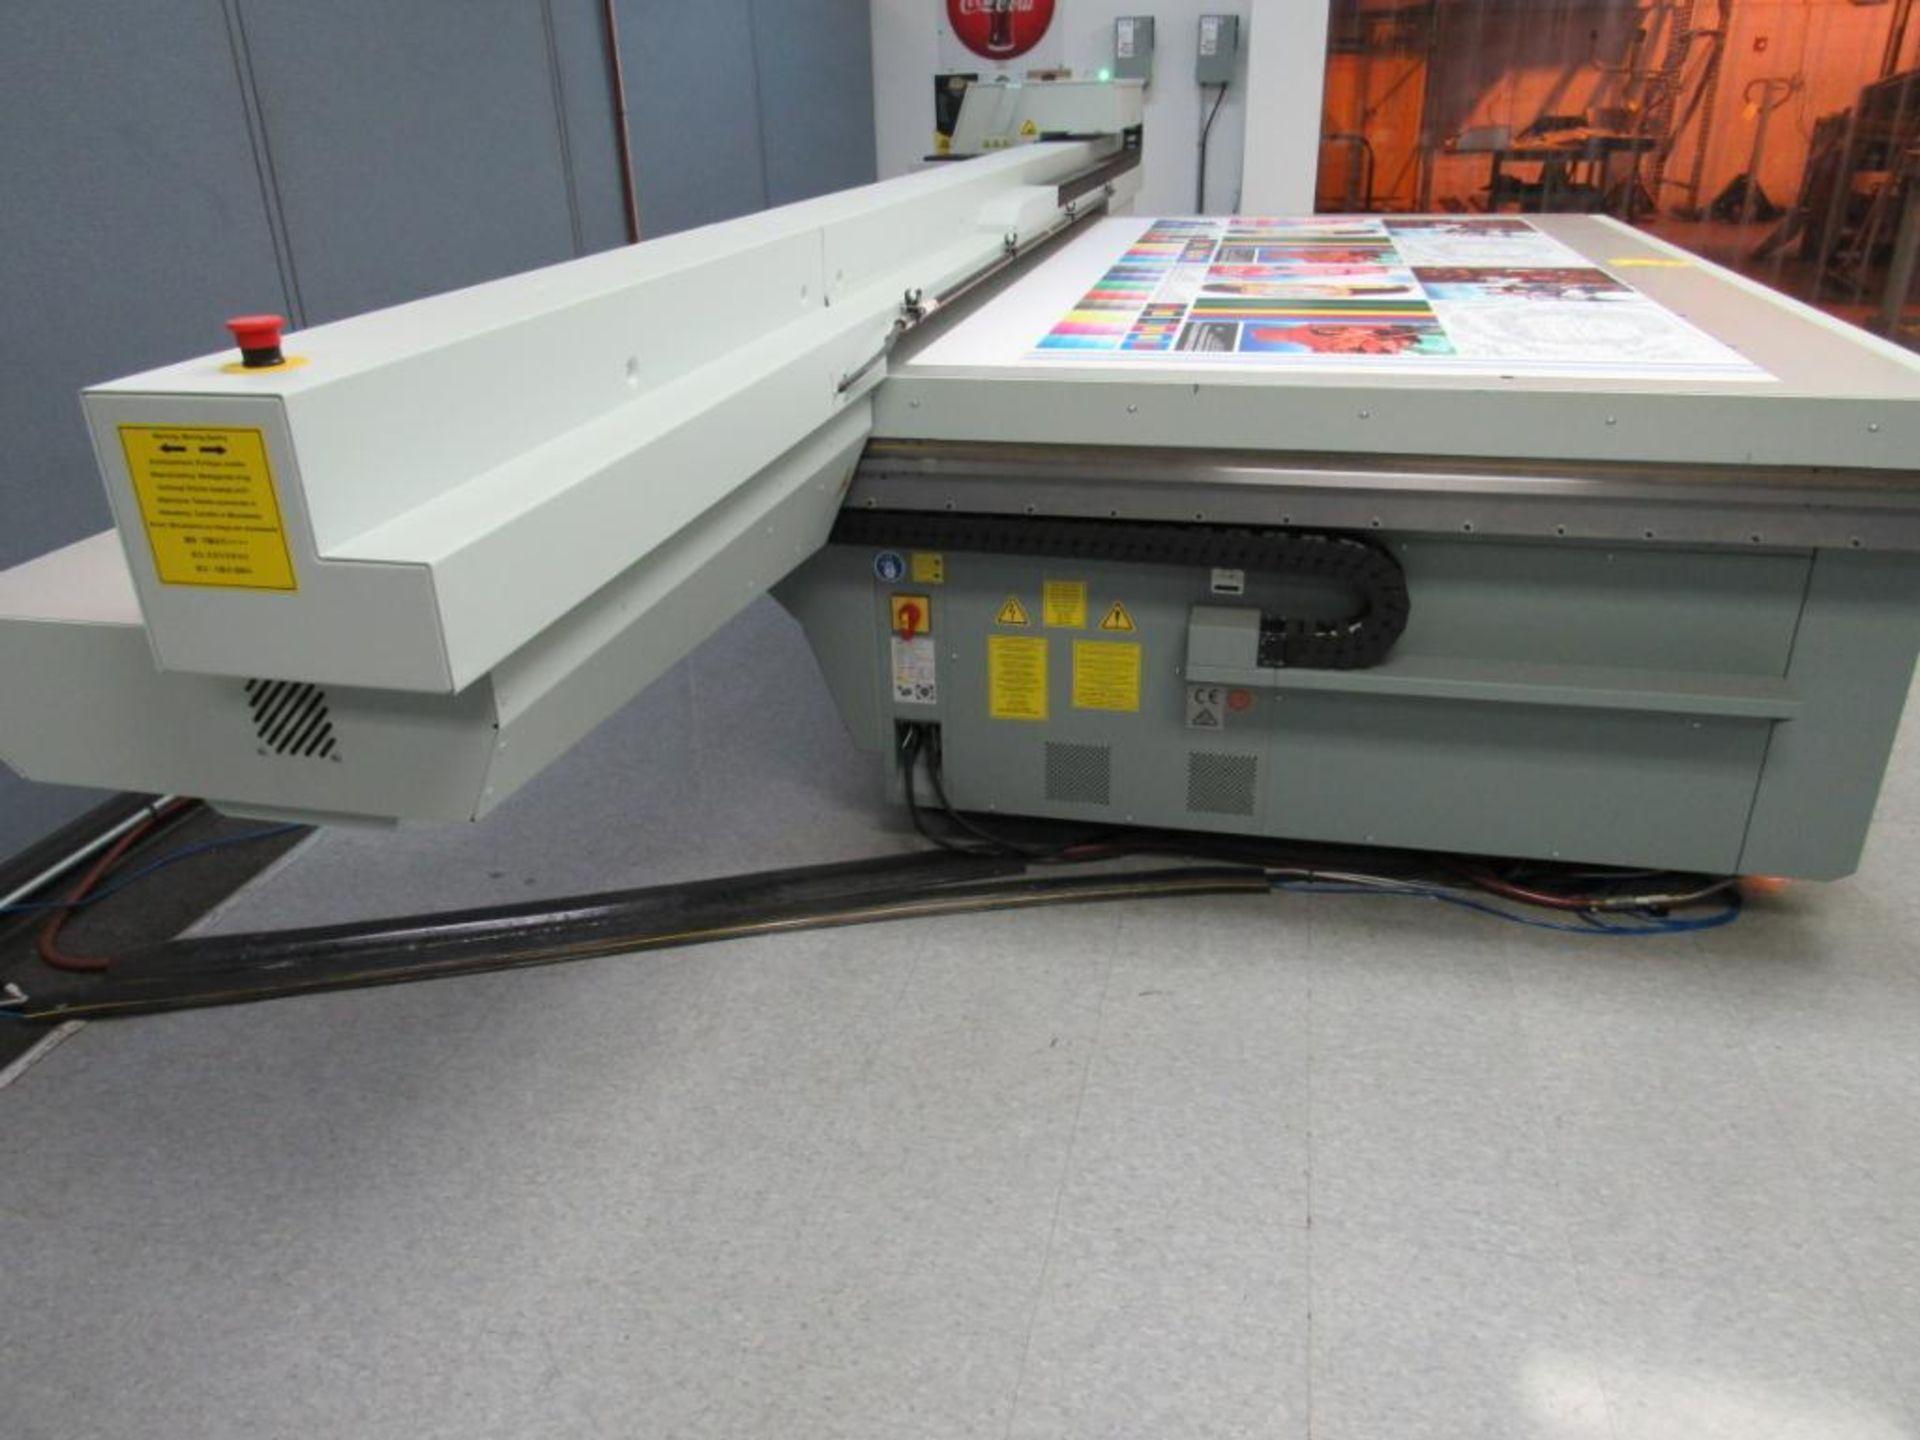 2018 OCE Arizona 2260 GT, High Volume UV Flatbed Printer, 6-Ink Channels, 49 in. x 98.4 in. Rigid - Image 2 of 6